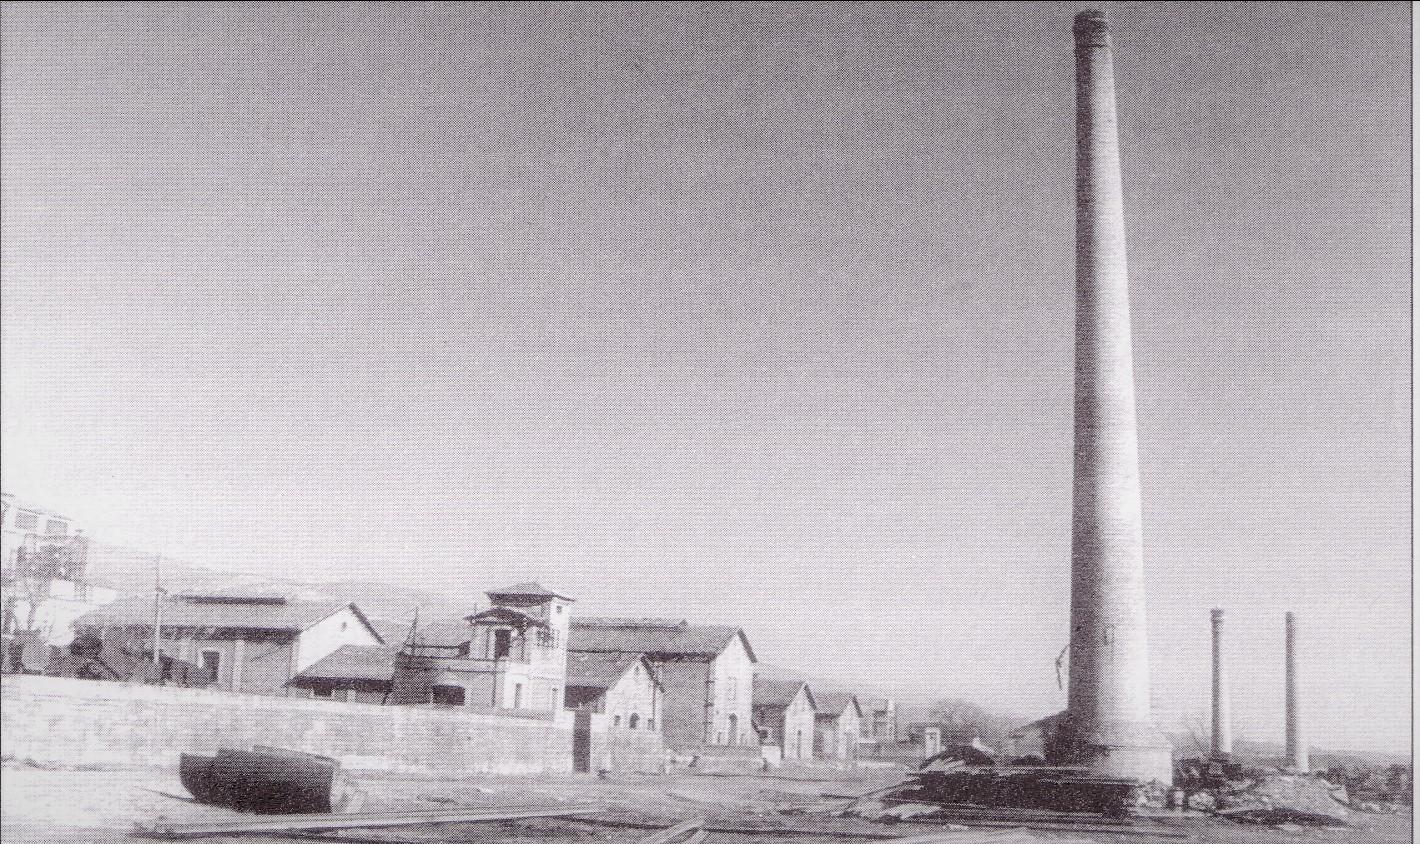 Destilación Calatrava